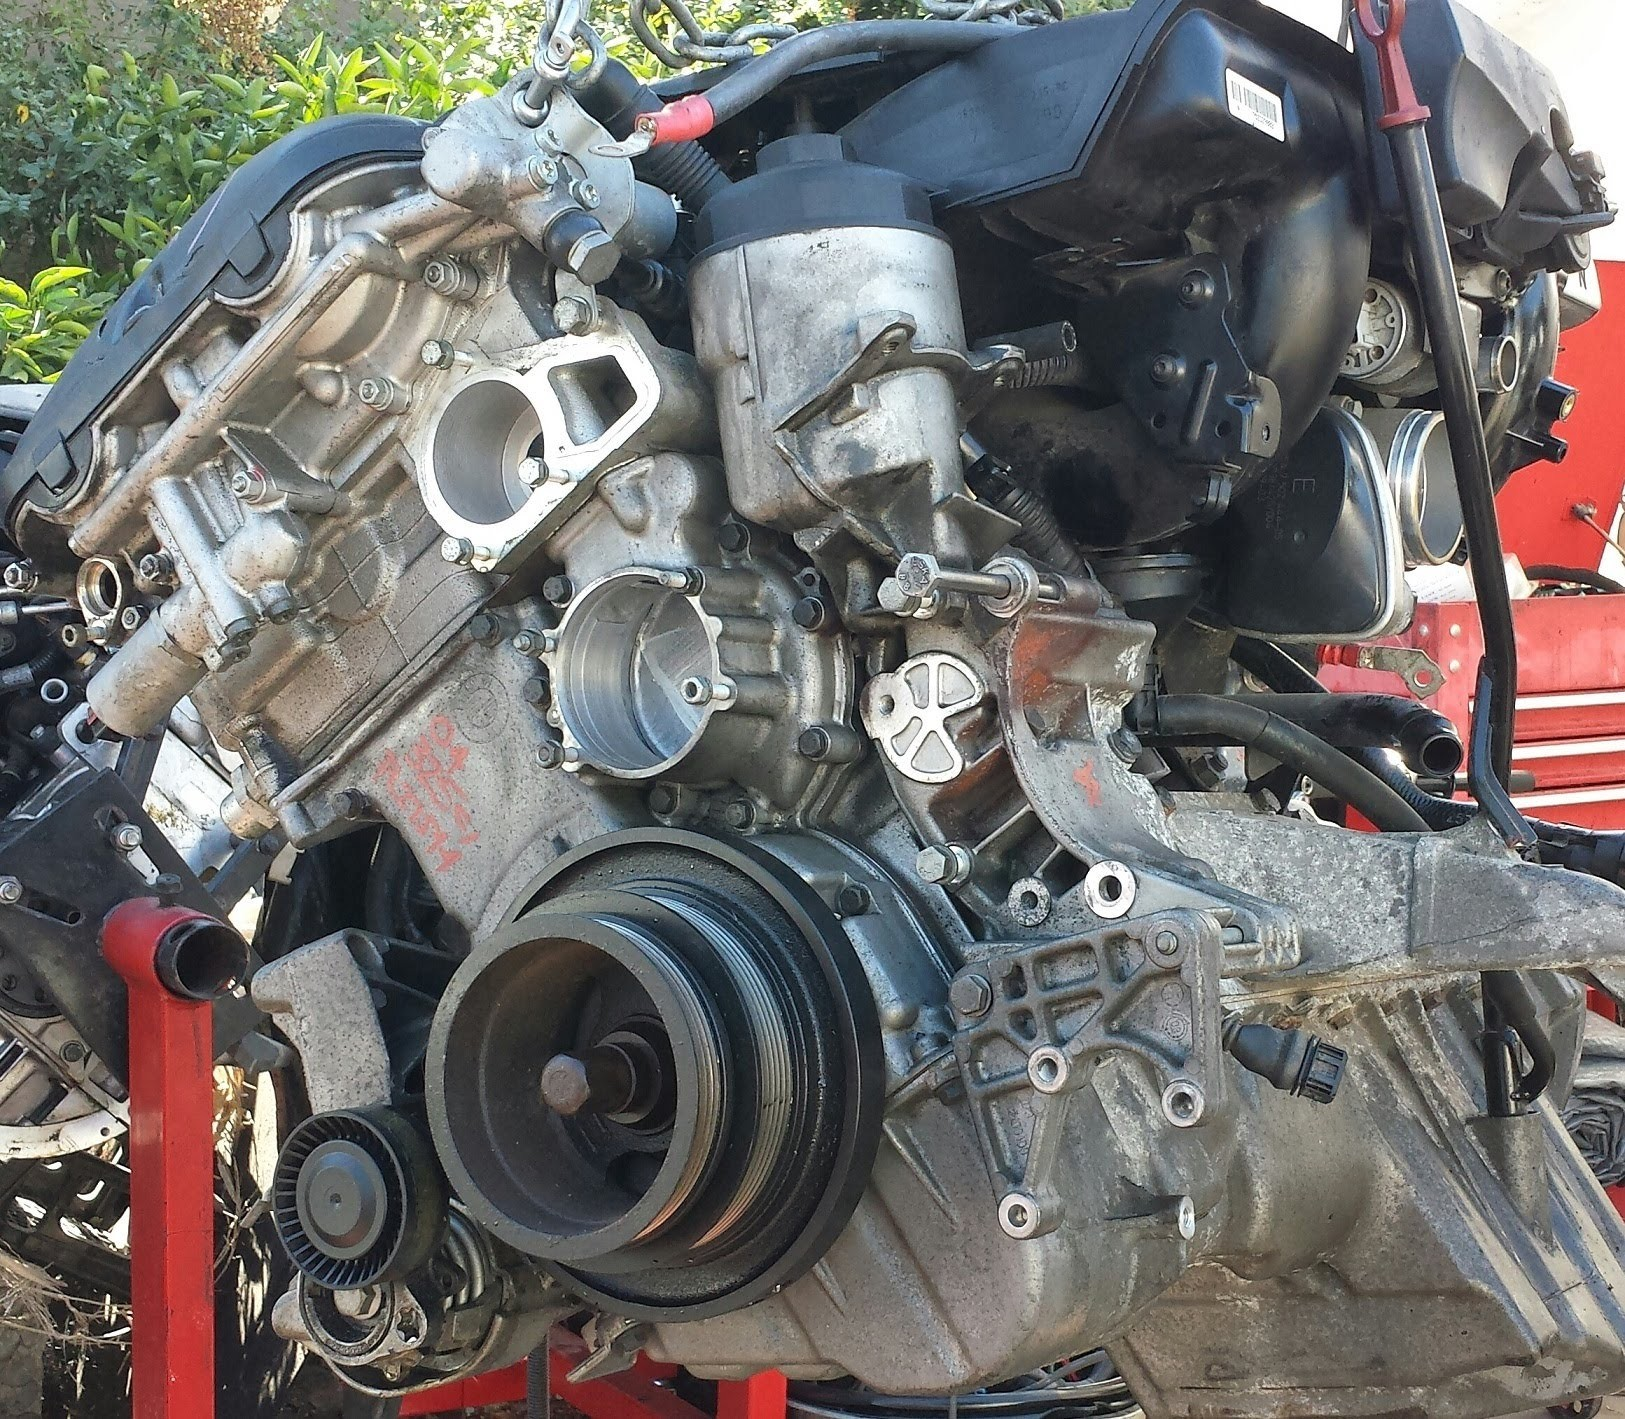 Car Hood Diagram Bmw M54b30 Engine Sensors and Parts Diagram Of Car Hood Diagram